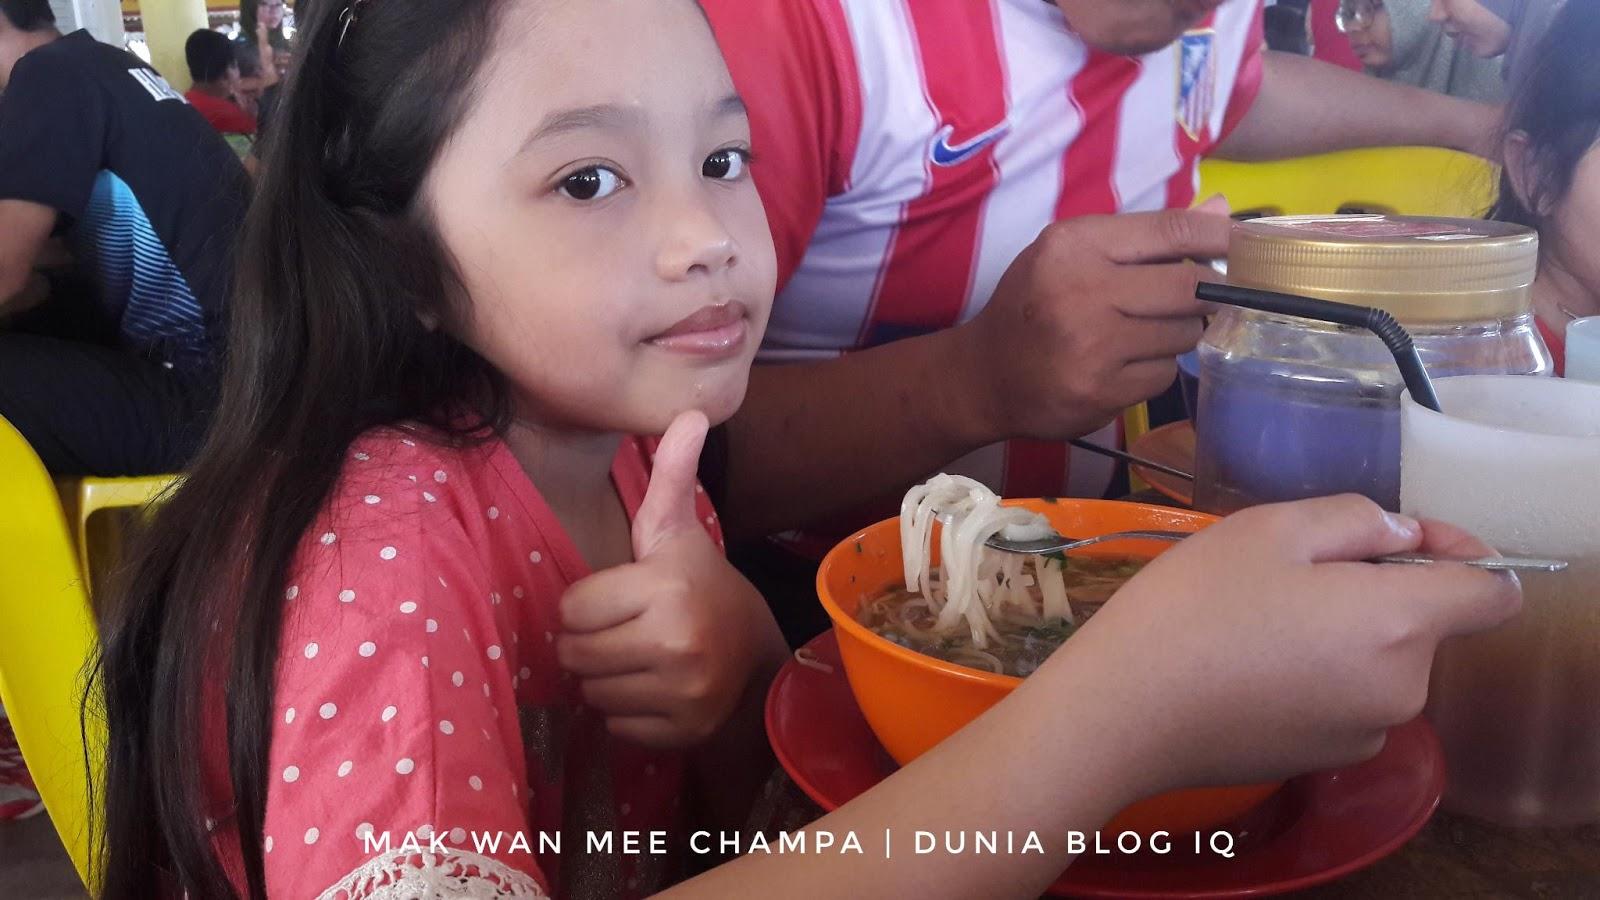 Mak Wan Mee Champa Tarikan Utama Pencari Makanan Di Dungun, Terengganu